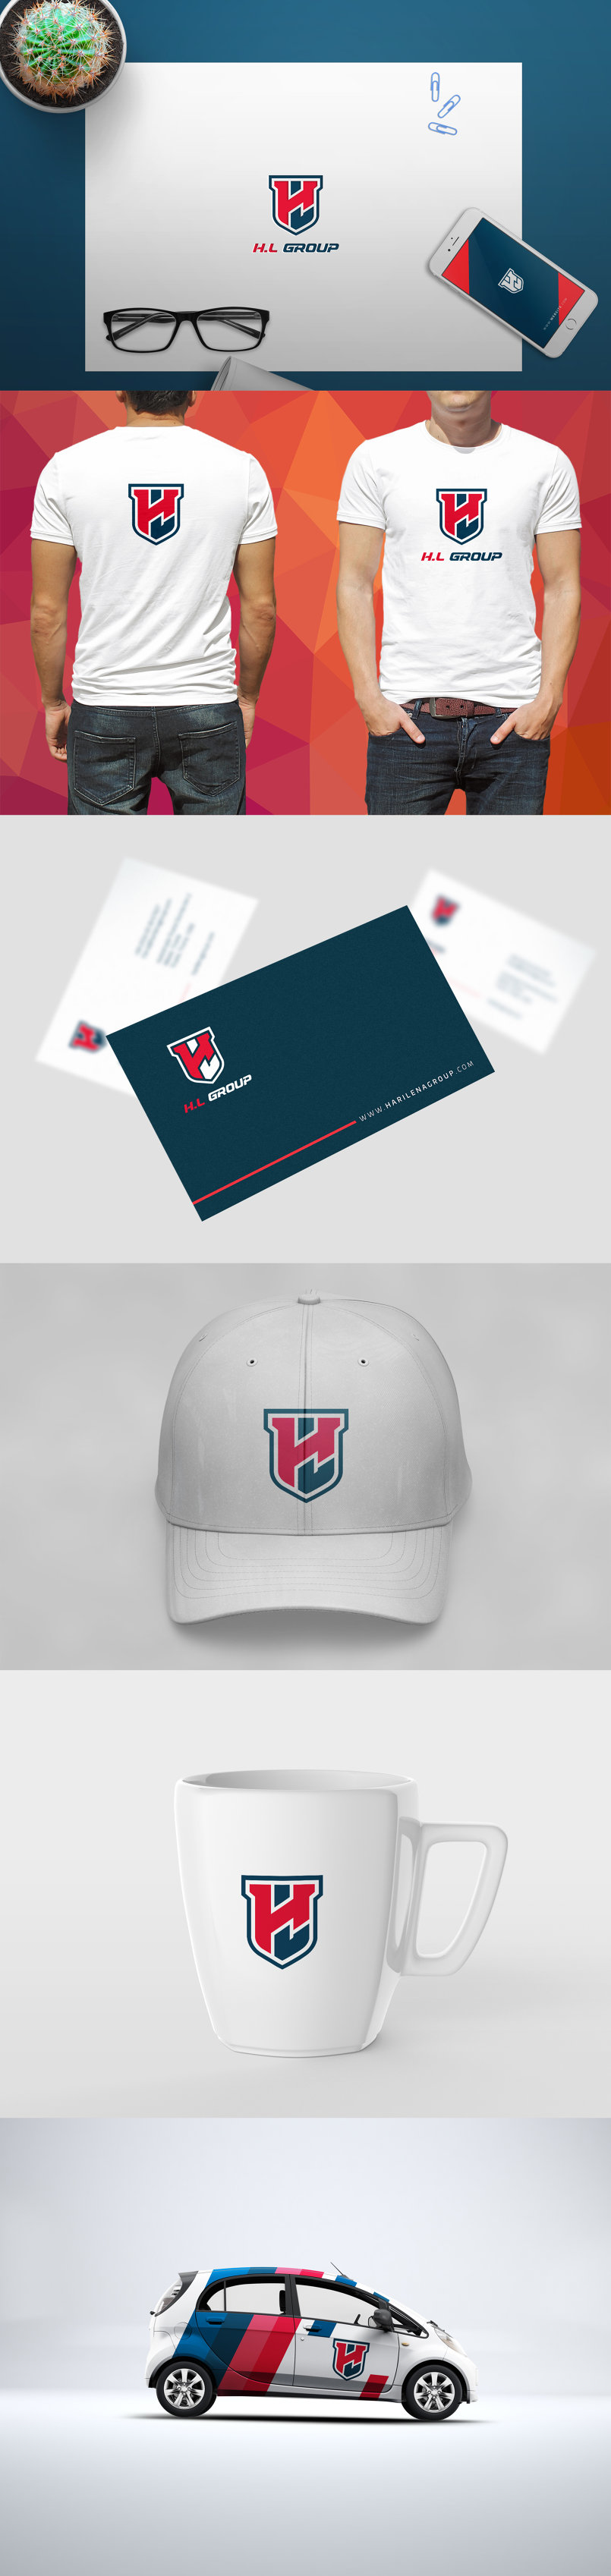 H.L Group Brand identity design